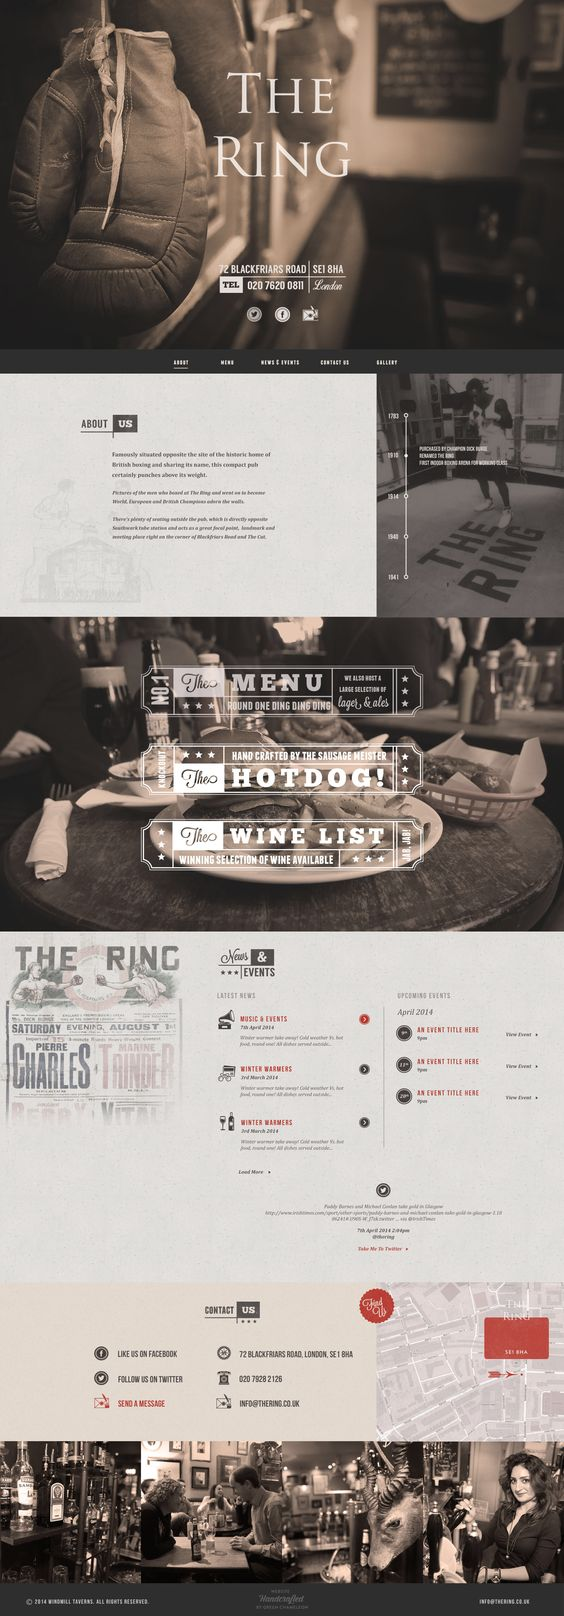 Unique Web Design, The Ring Pub London